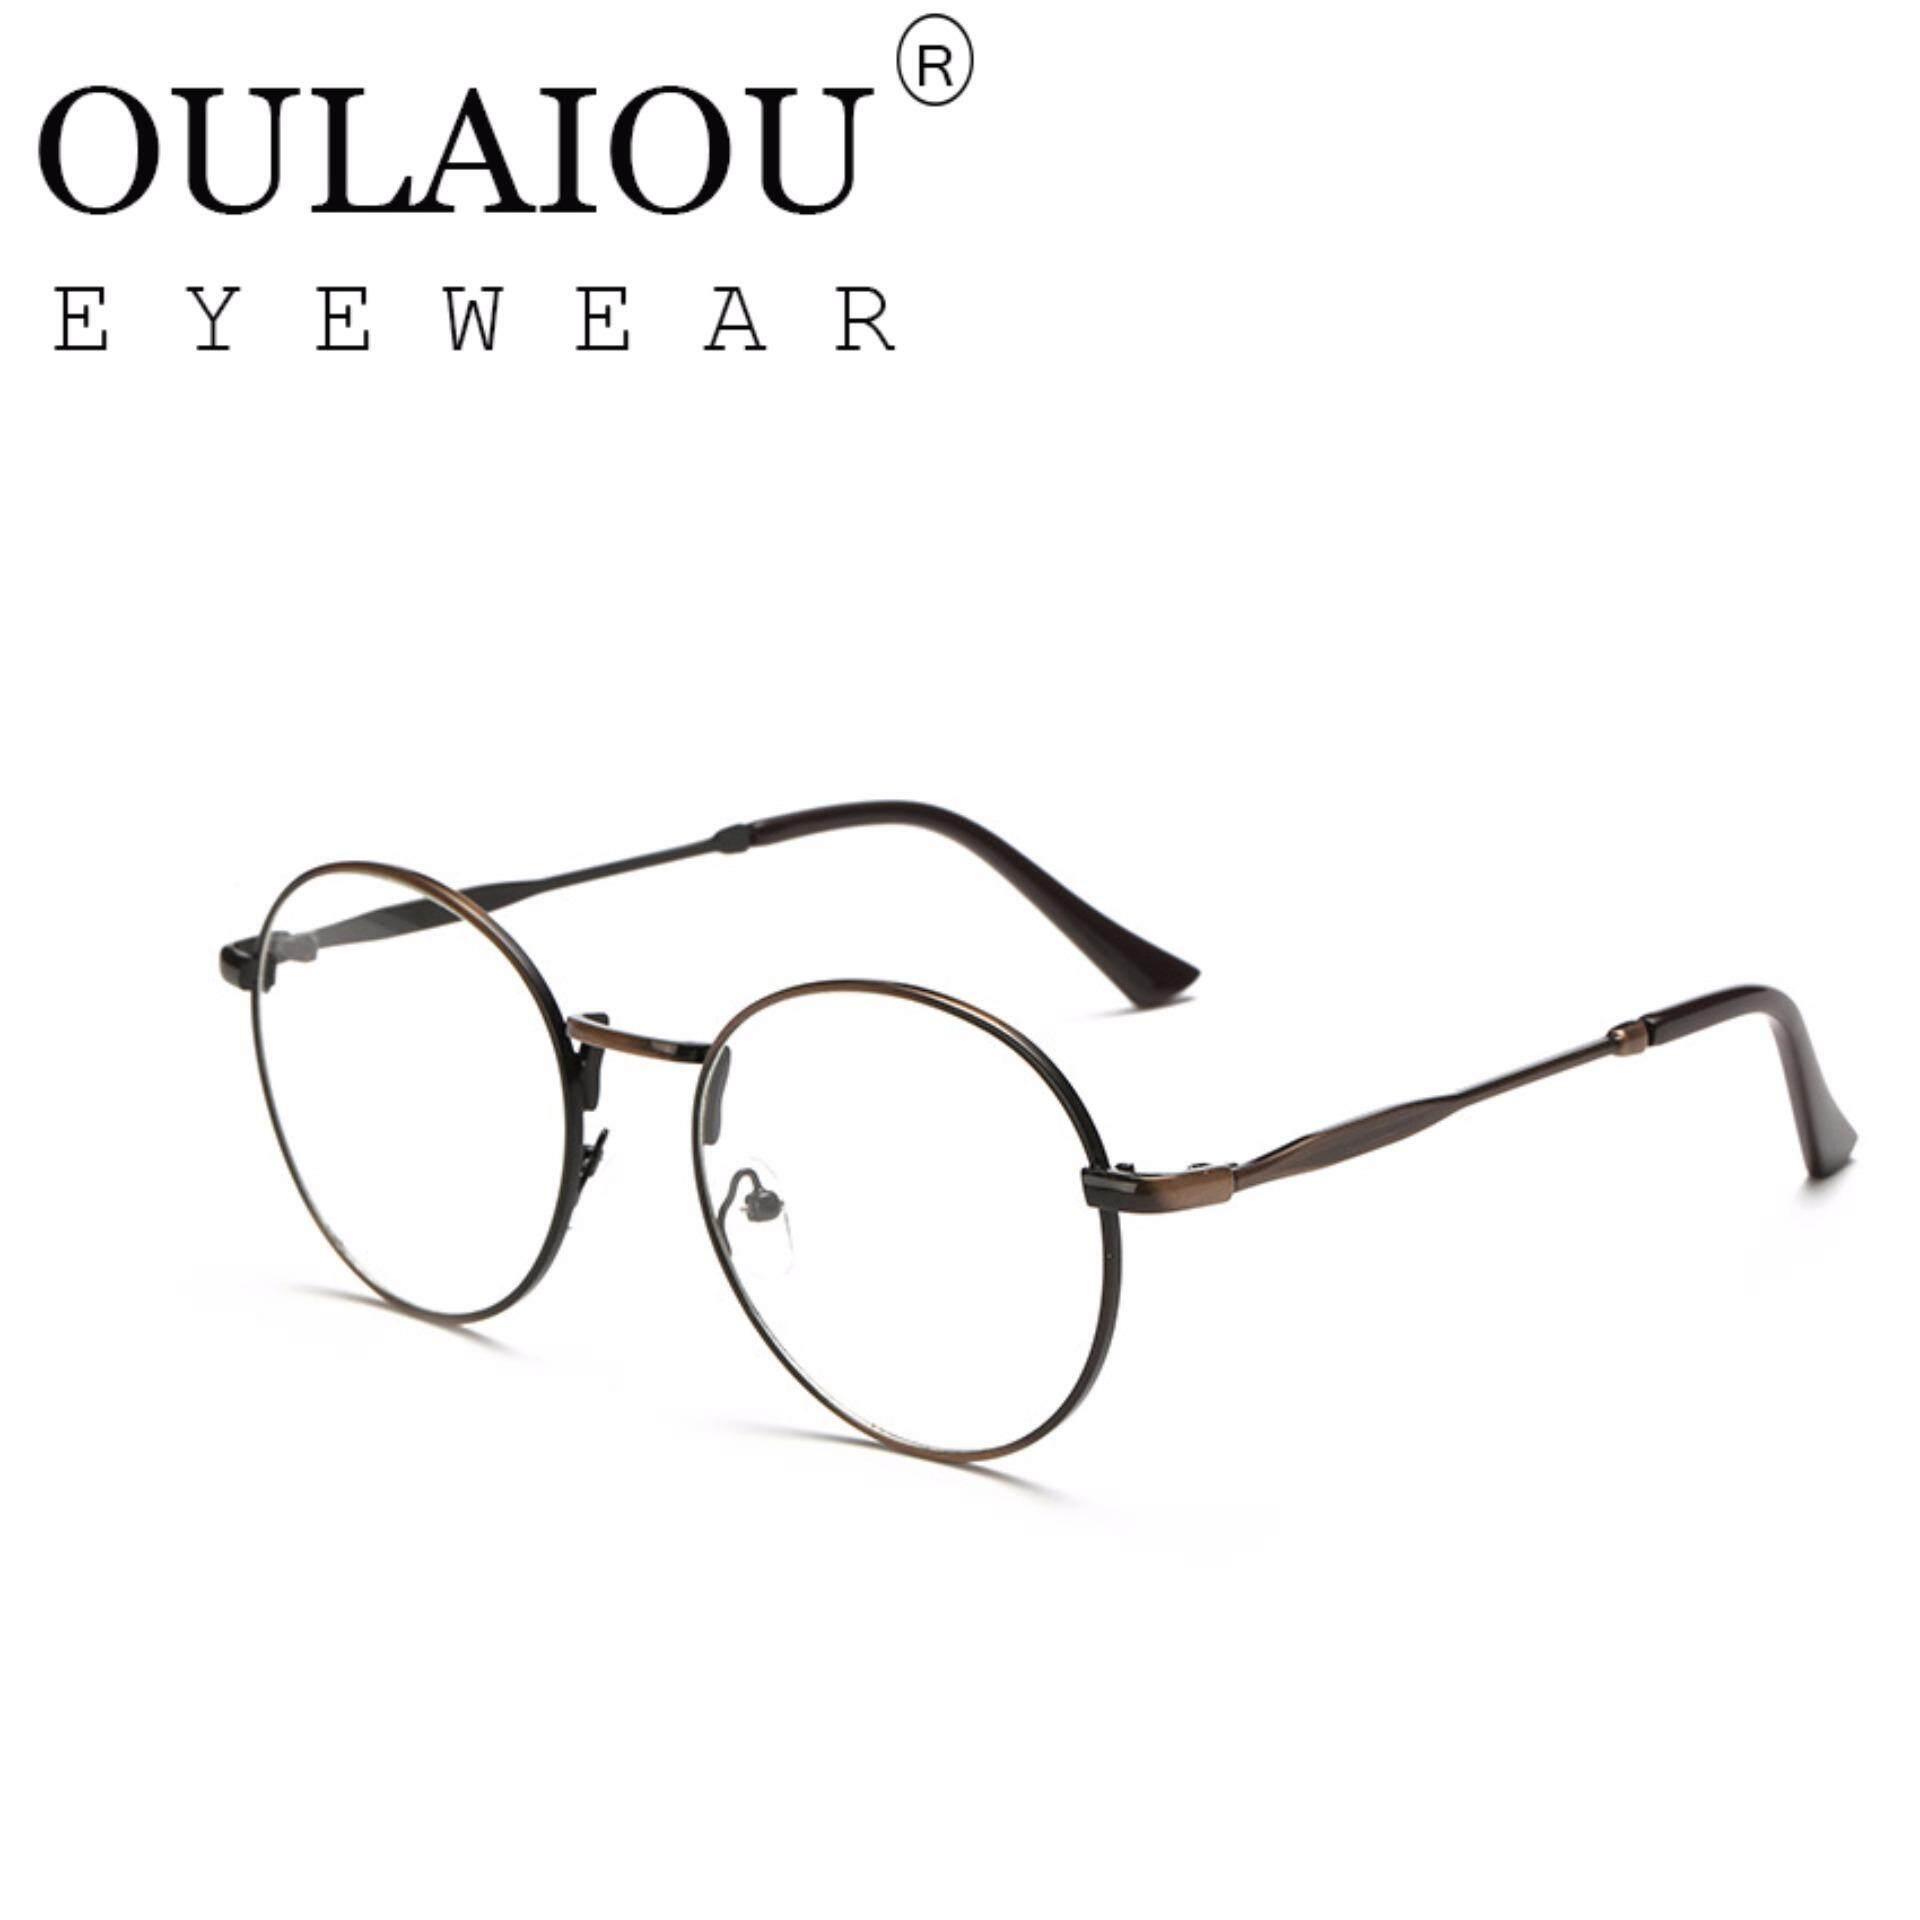 TIANYOU JD Oulaiou Fashion Accessories Anti-fatigue Trendy Eyewear Reading Glasses OJ9711